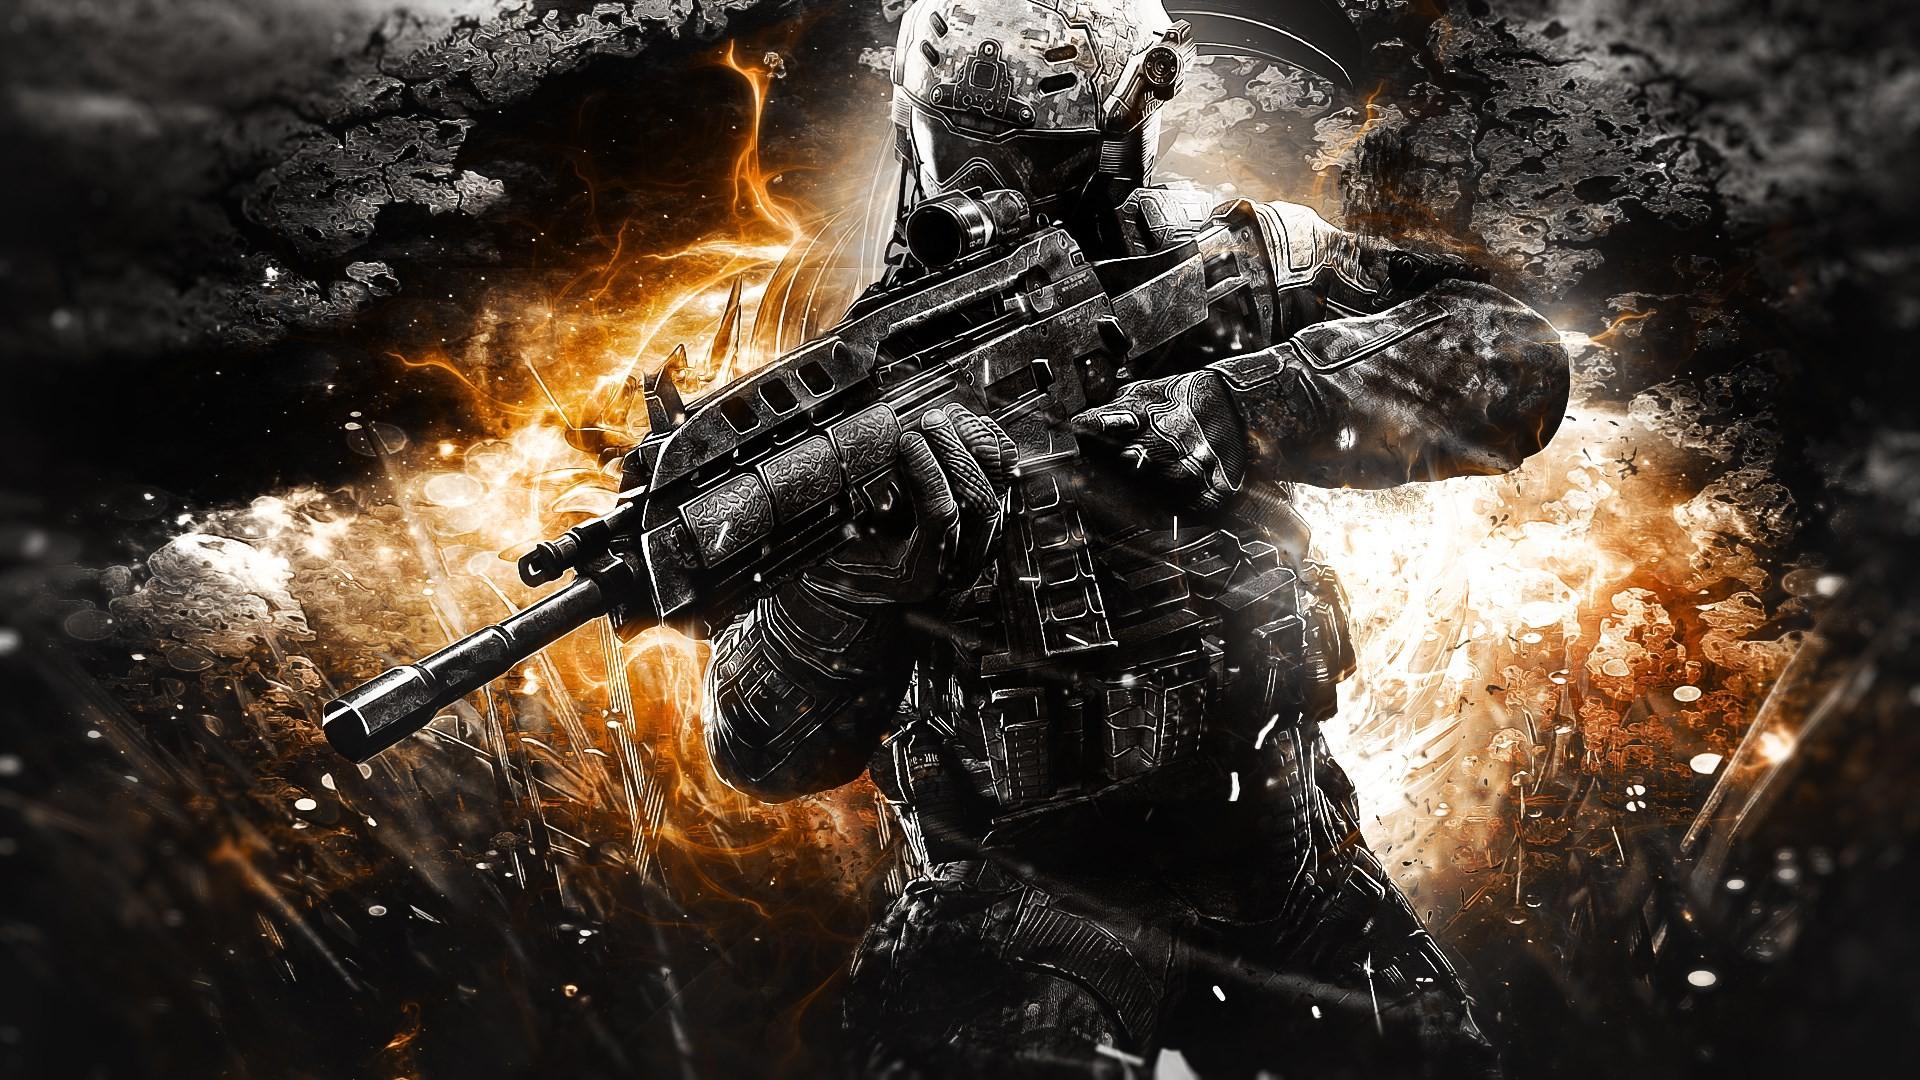 Call Of Duty Black Ops Ii Fondo De Pantalla Hd Fondo De